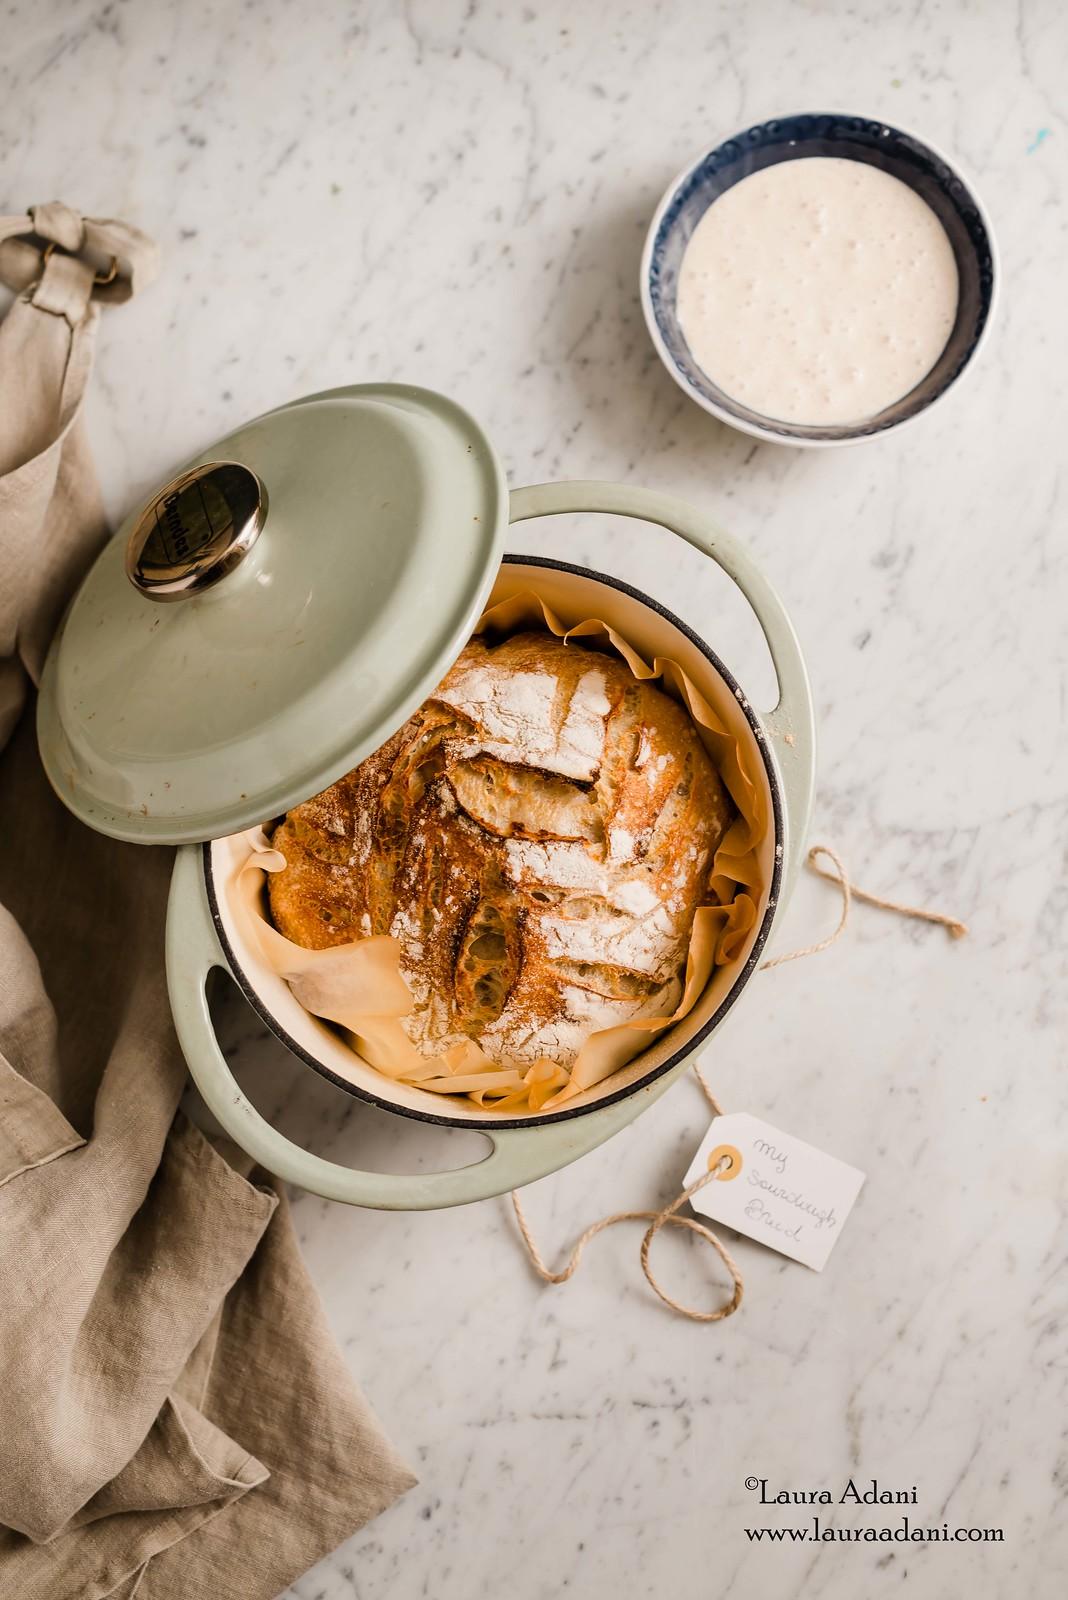 Pane a lievitazione naturale - sourdough bread